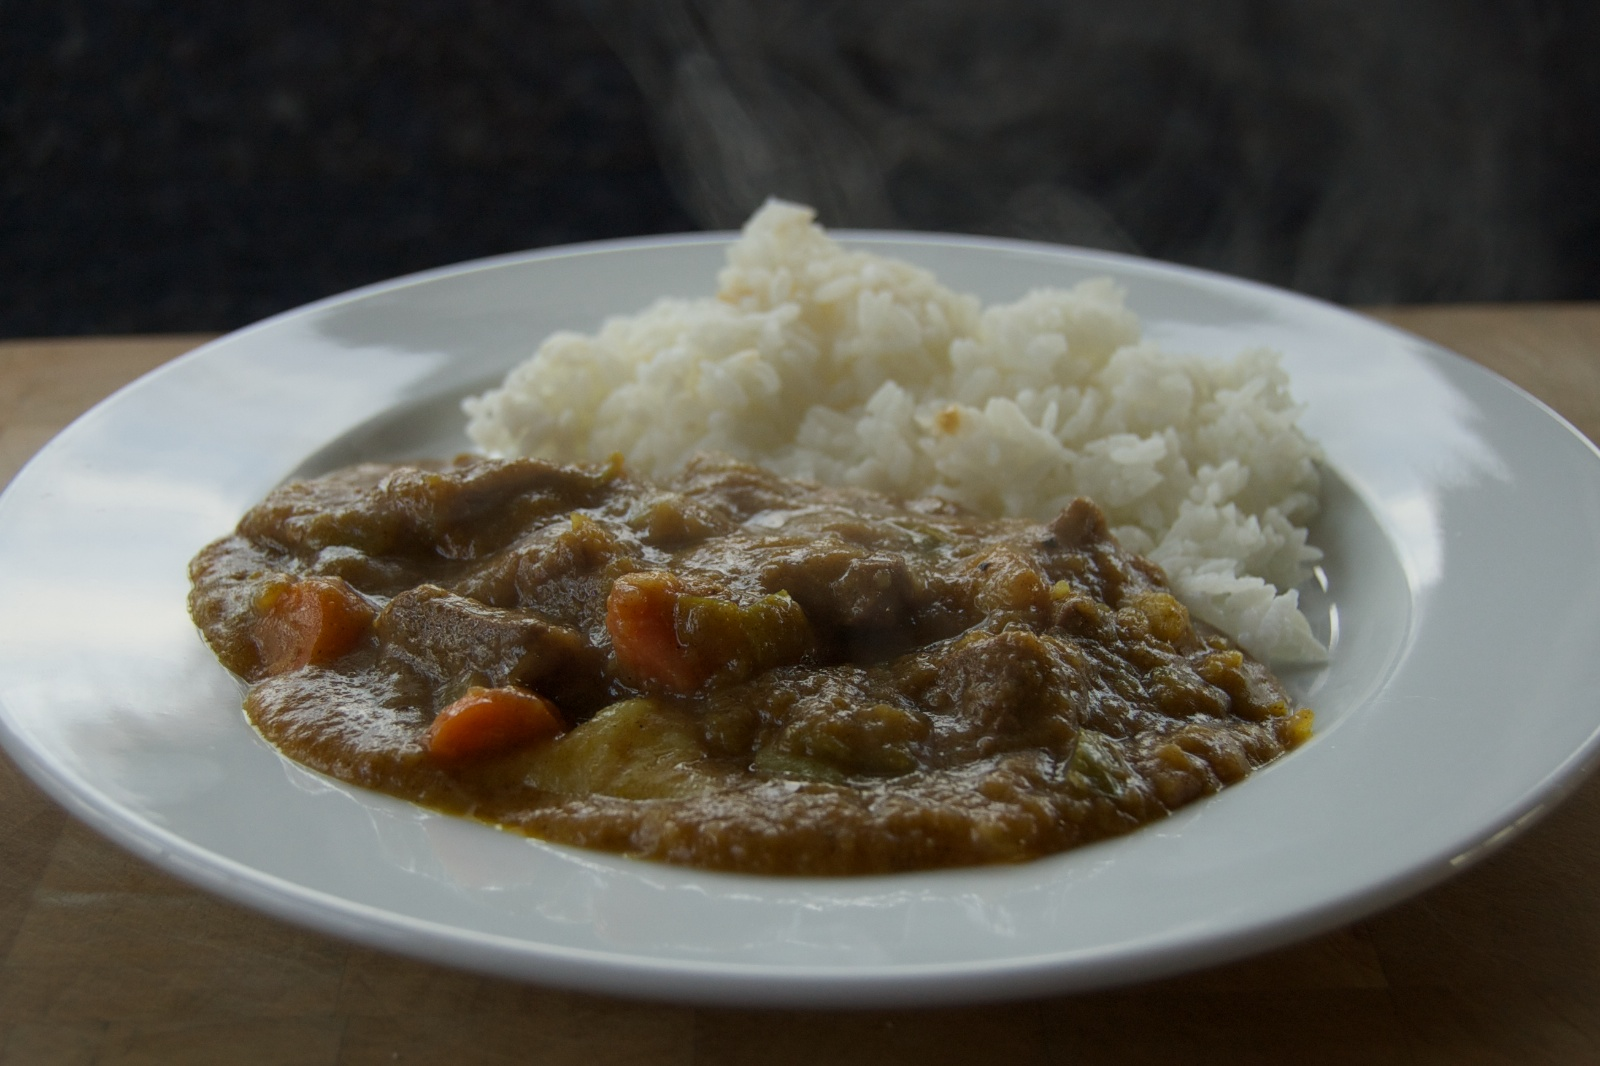 http://blog.rickk.com/food/2014/02/03/ate.2014.02.03.d.jpg